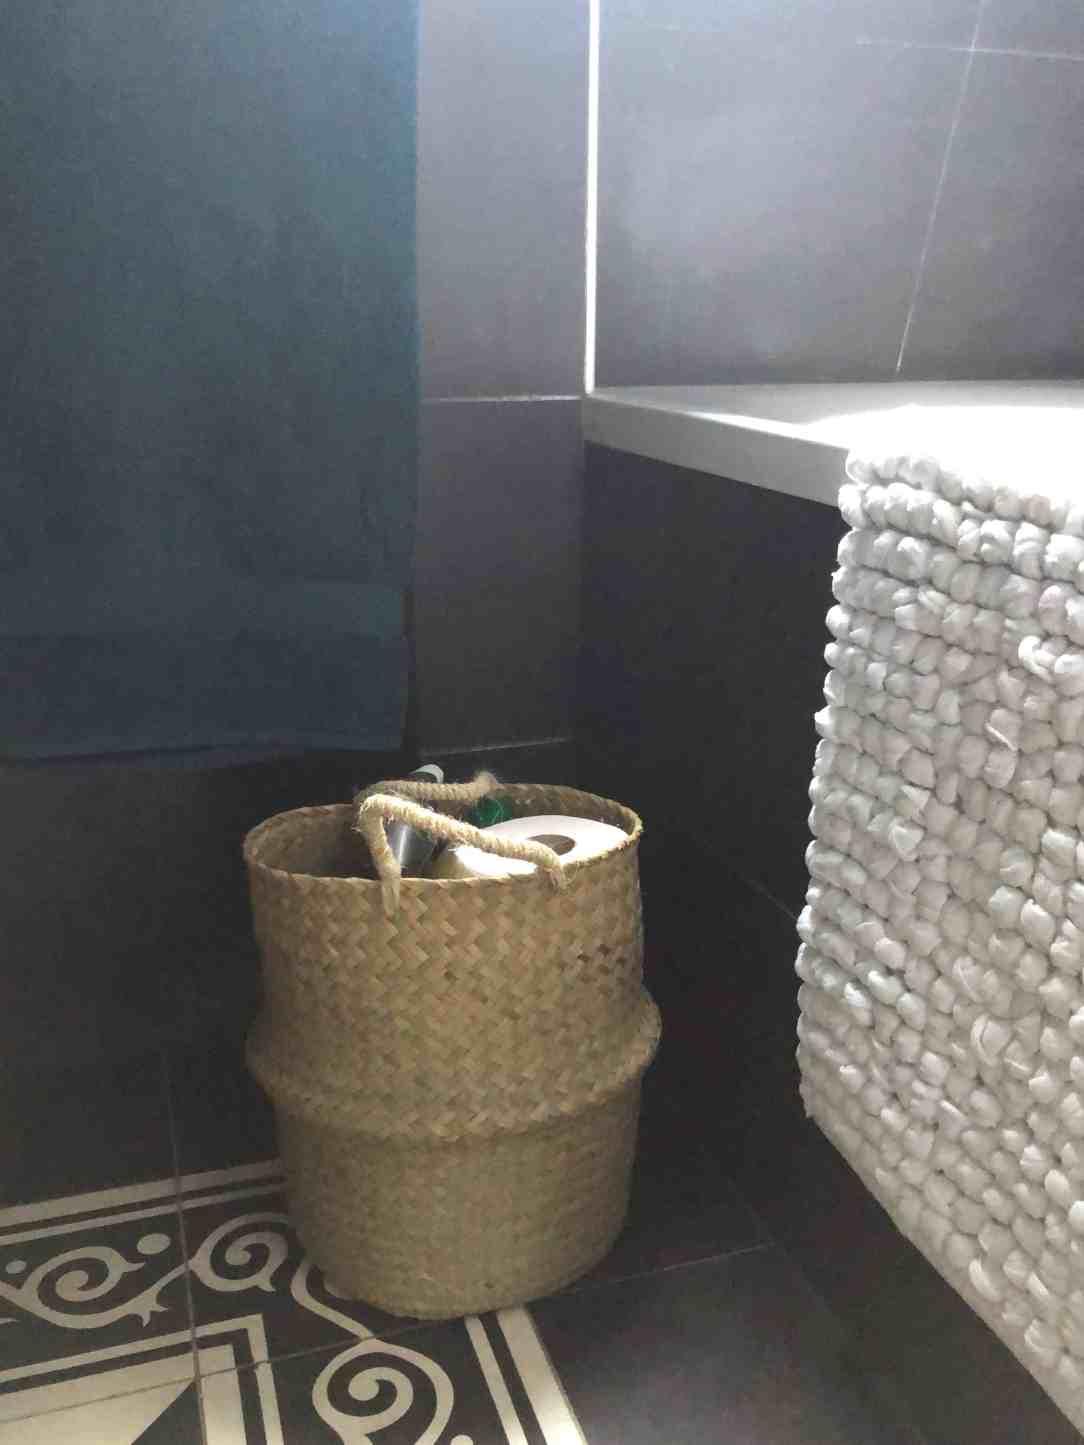 opgeruimd huis-mand in badkamer